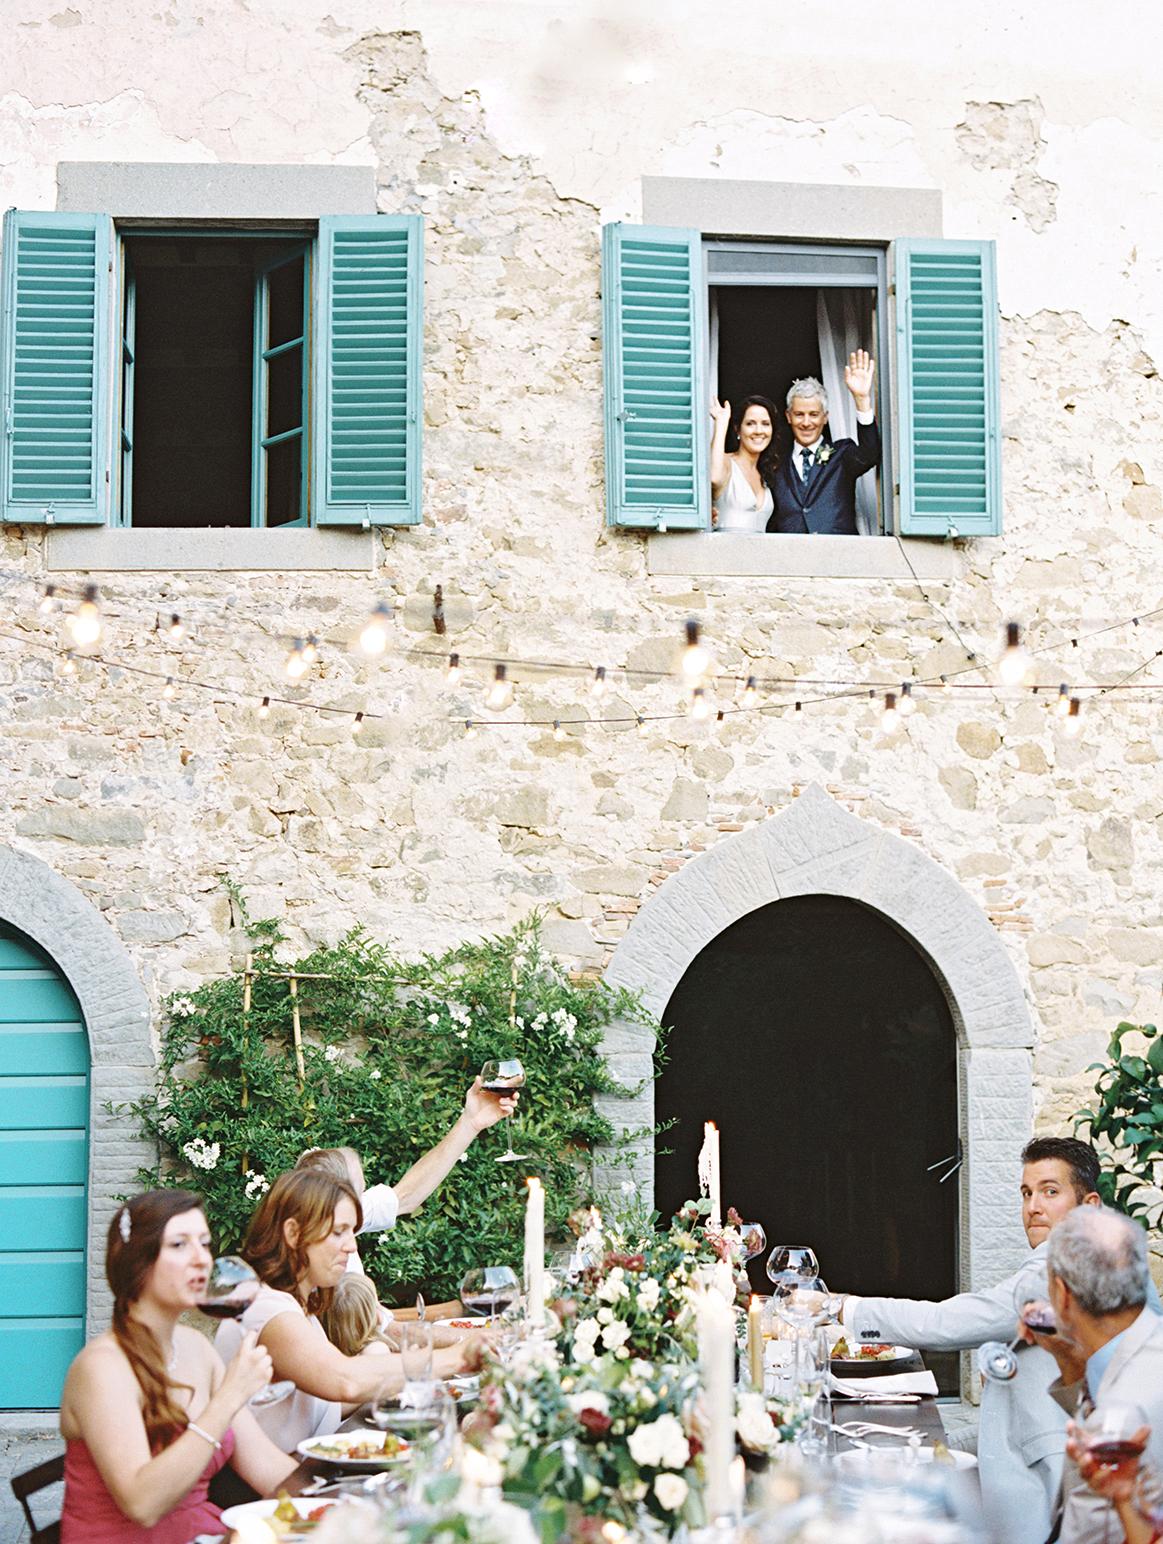 kelly pete wedding couple waving from window